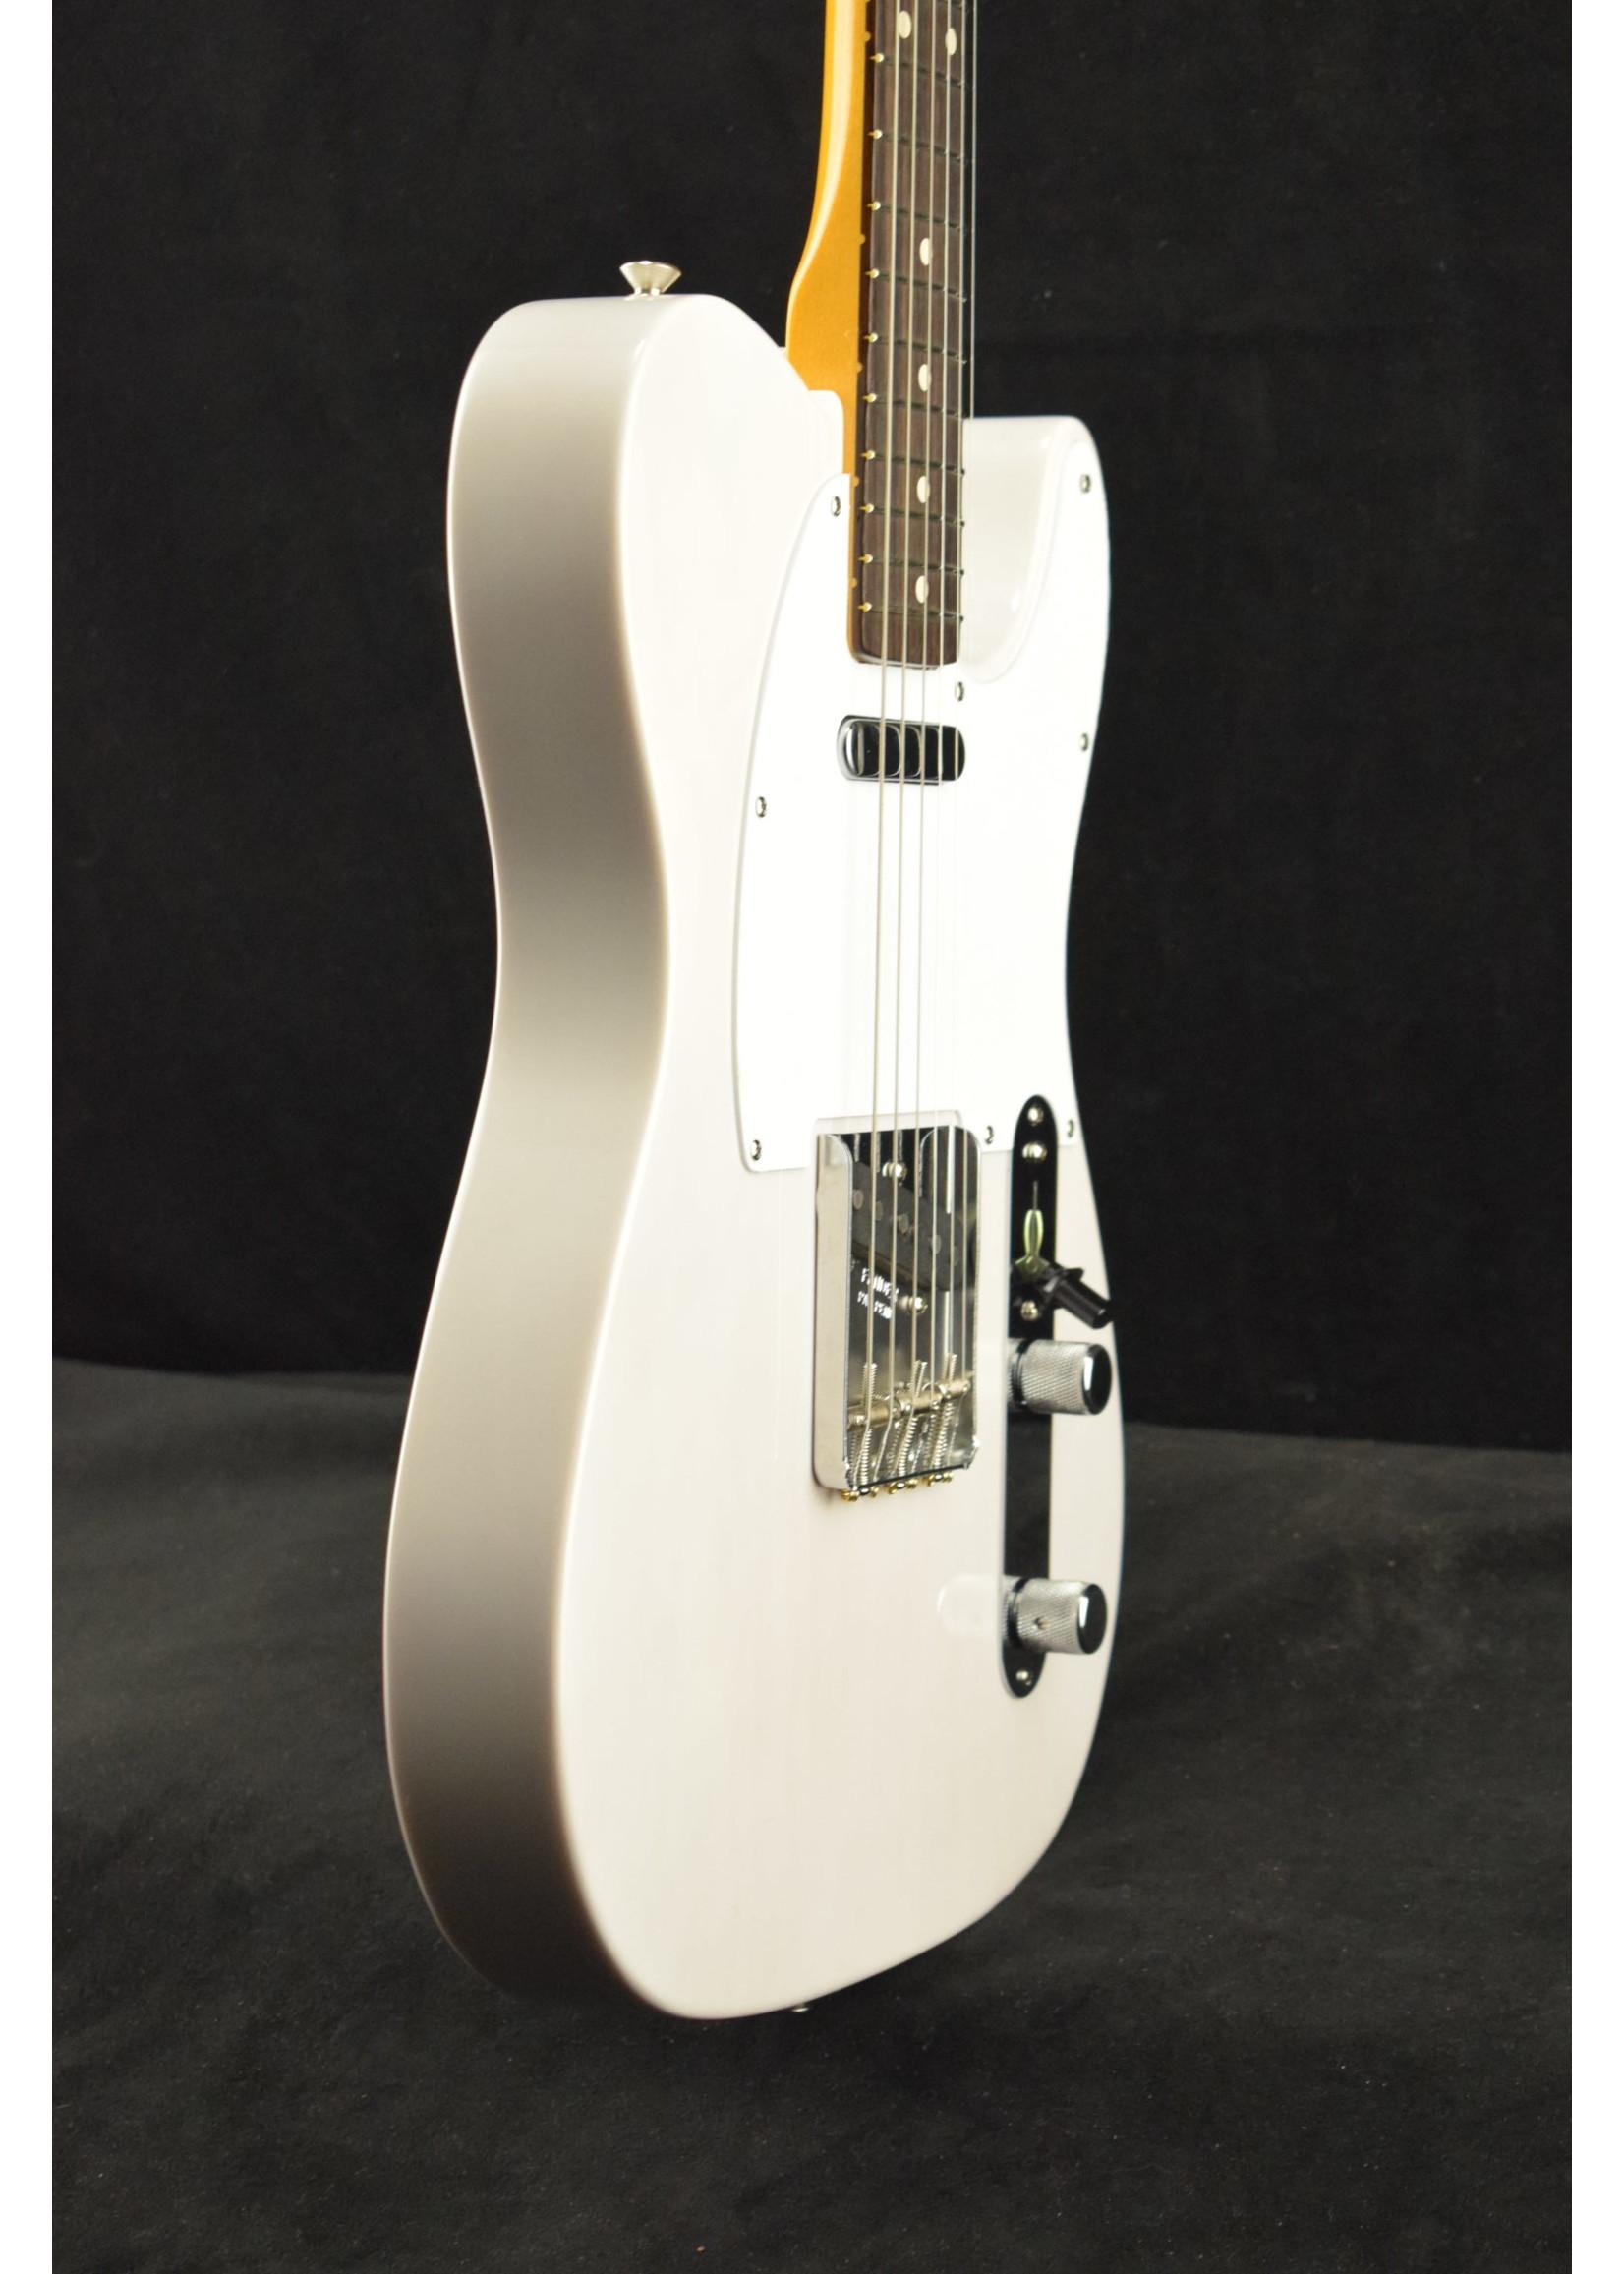 Fender Fender Jimmy Page Mirror Telecaster White Blonde